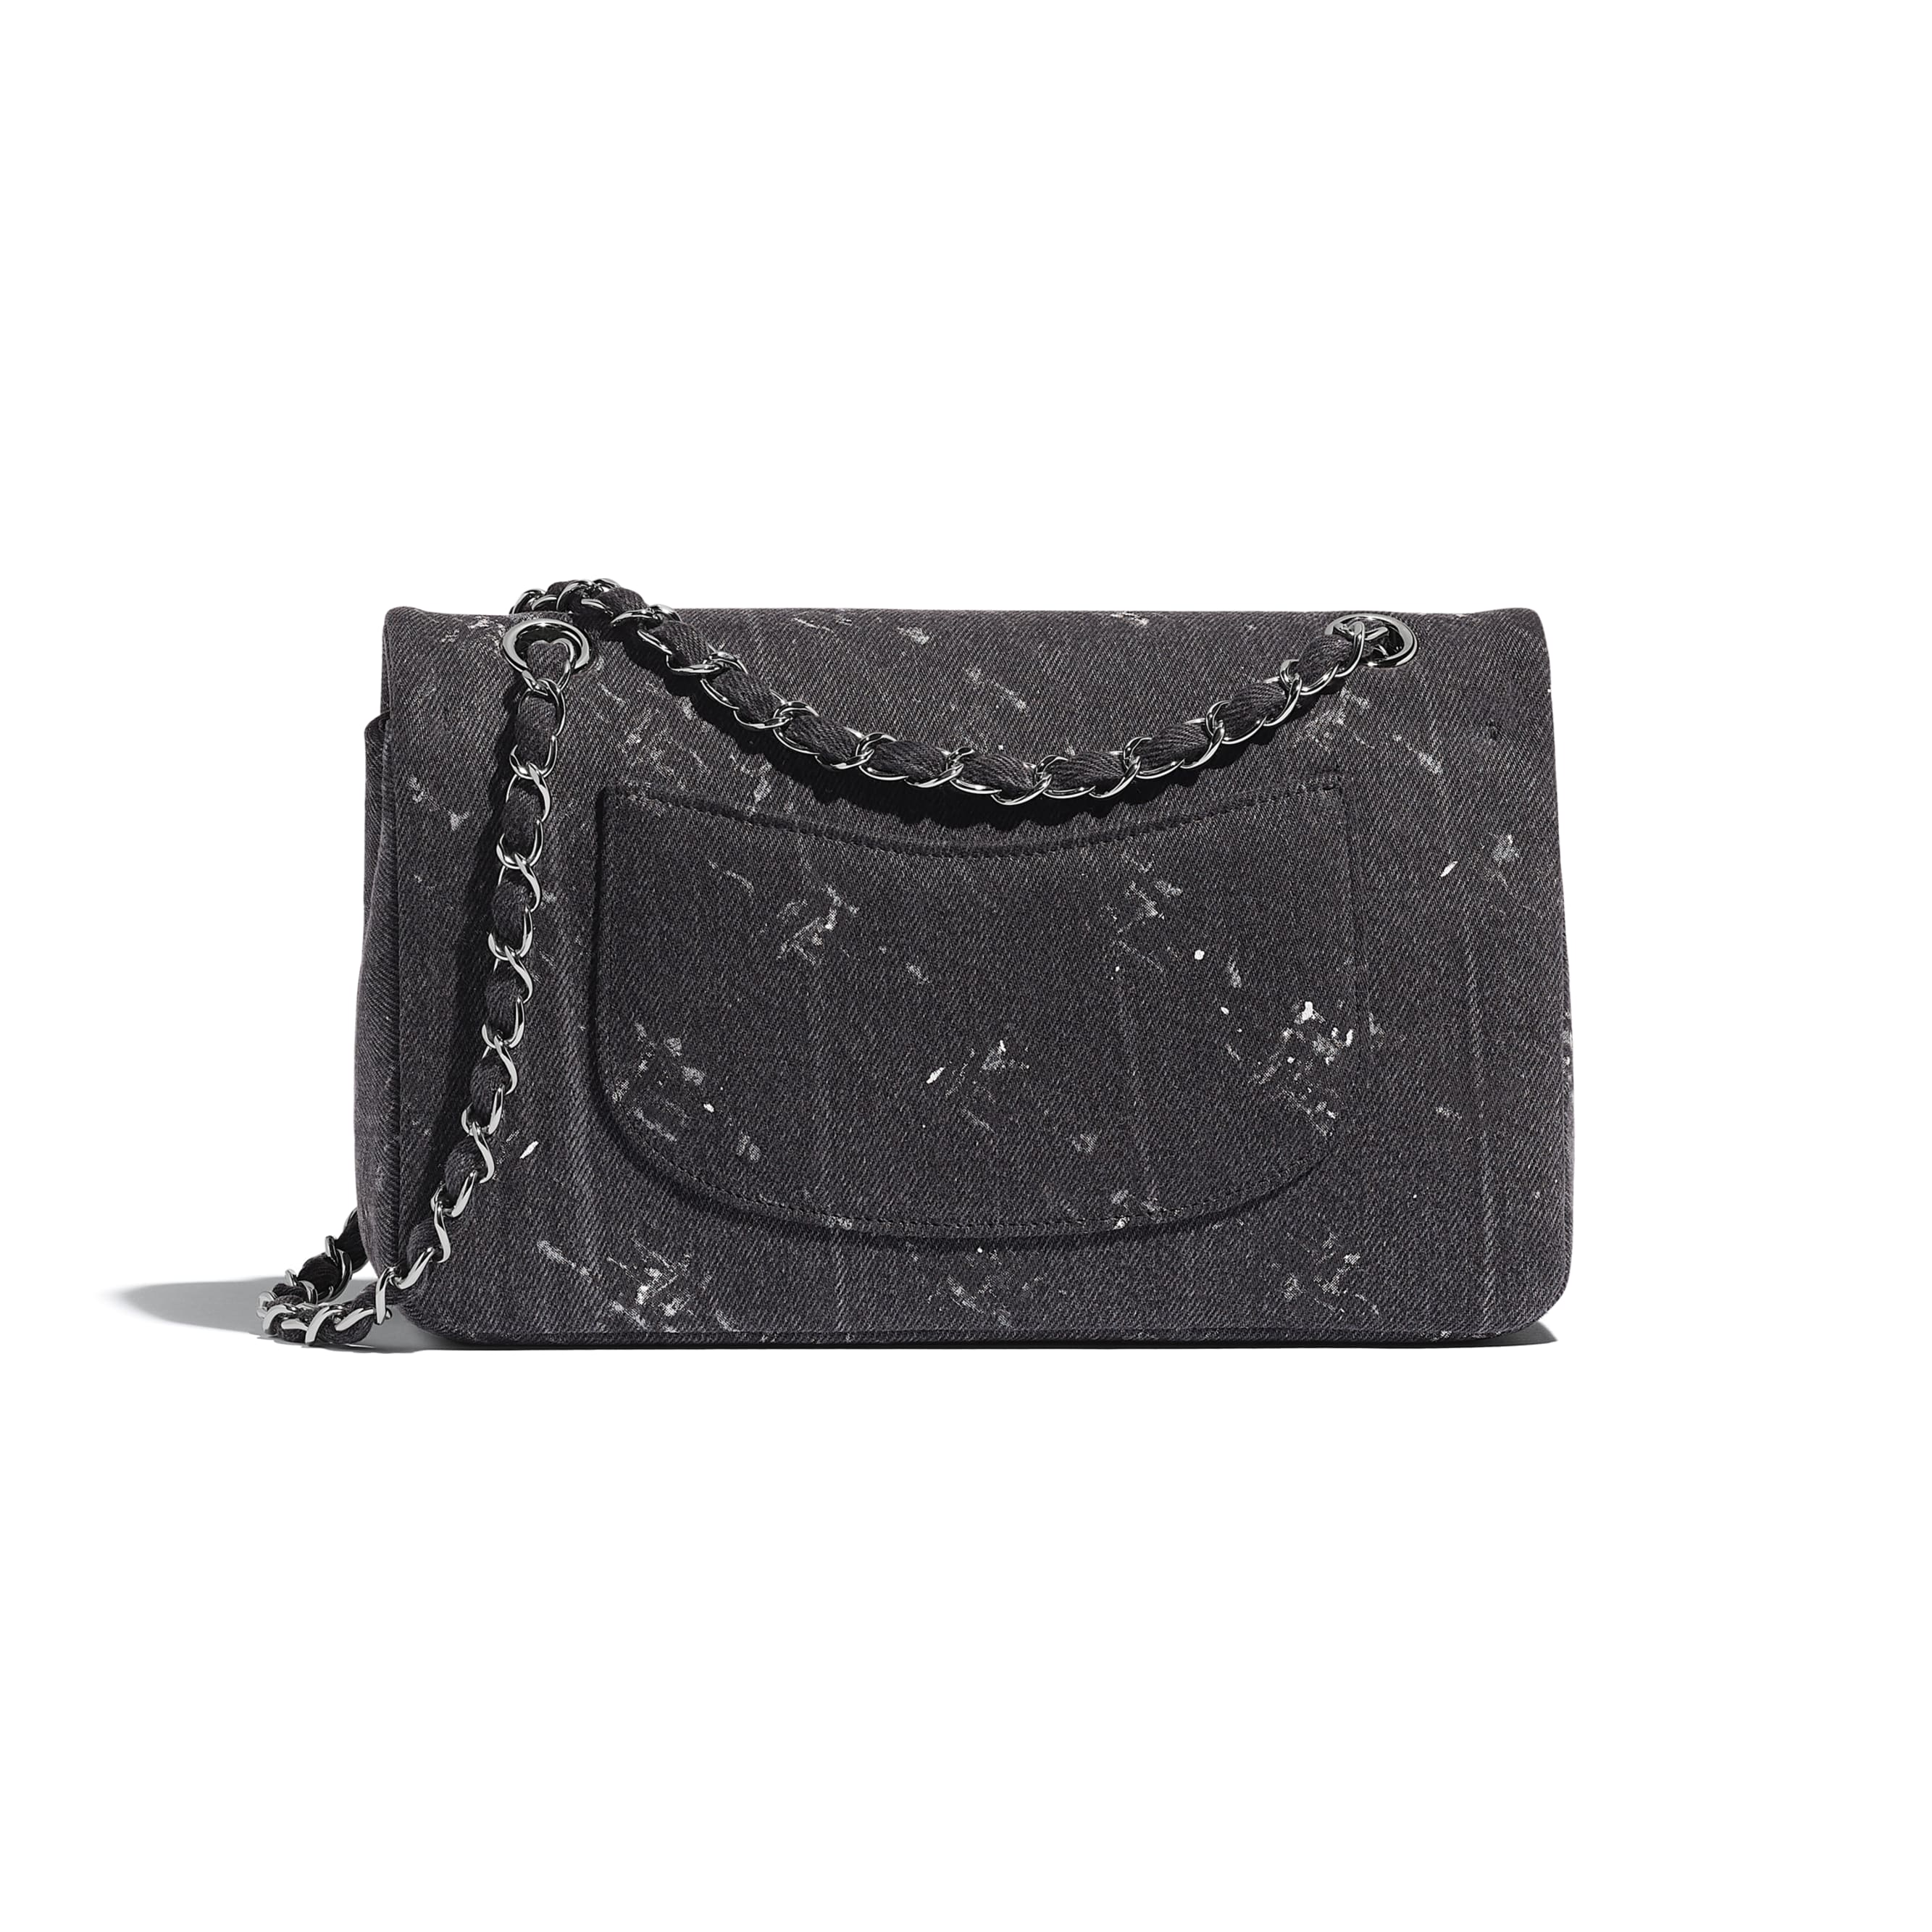 Classic Handbag - Black - Denim & Ruthenium-Finish Metal - Alternative view - see standard sized version